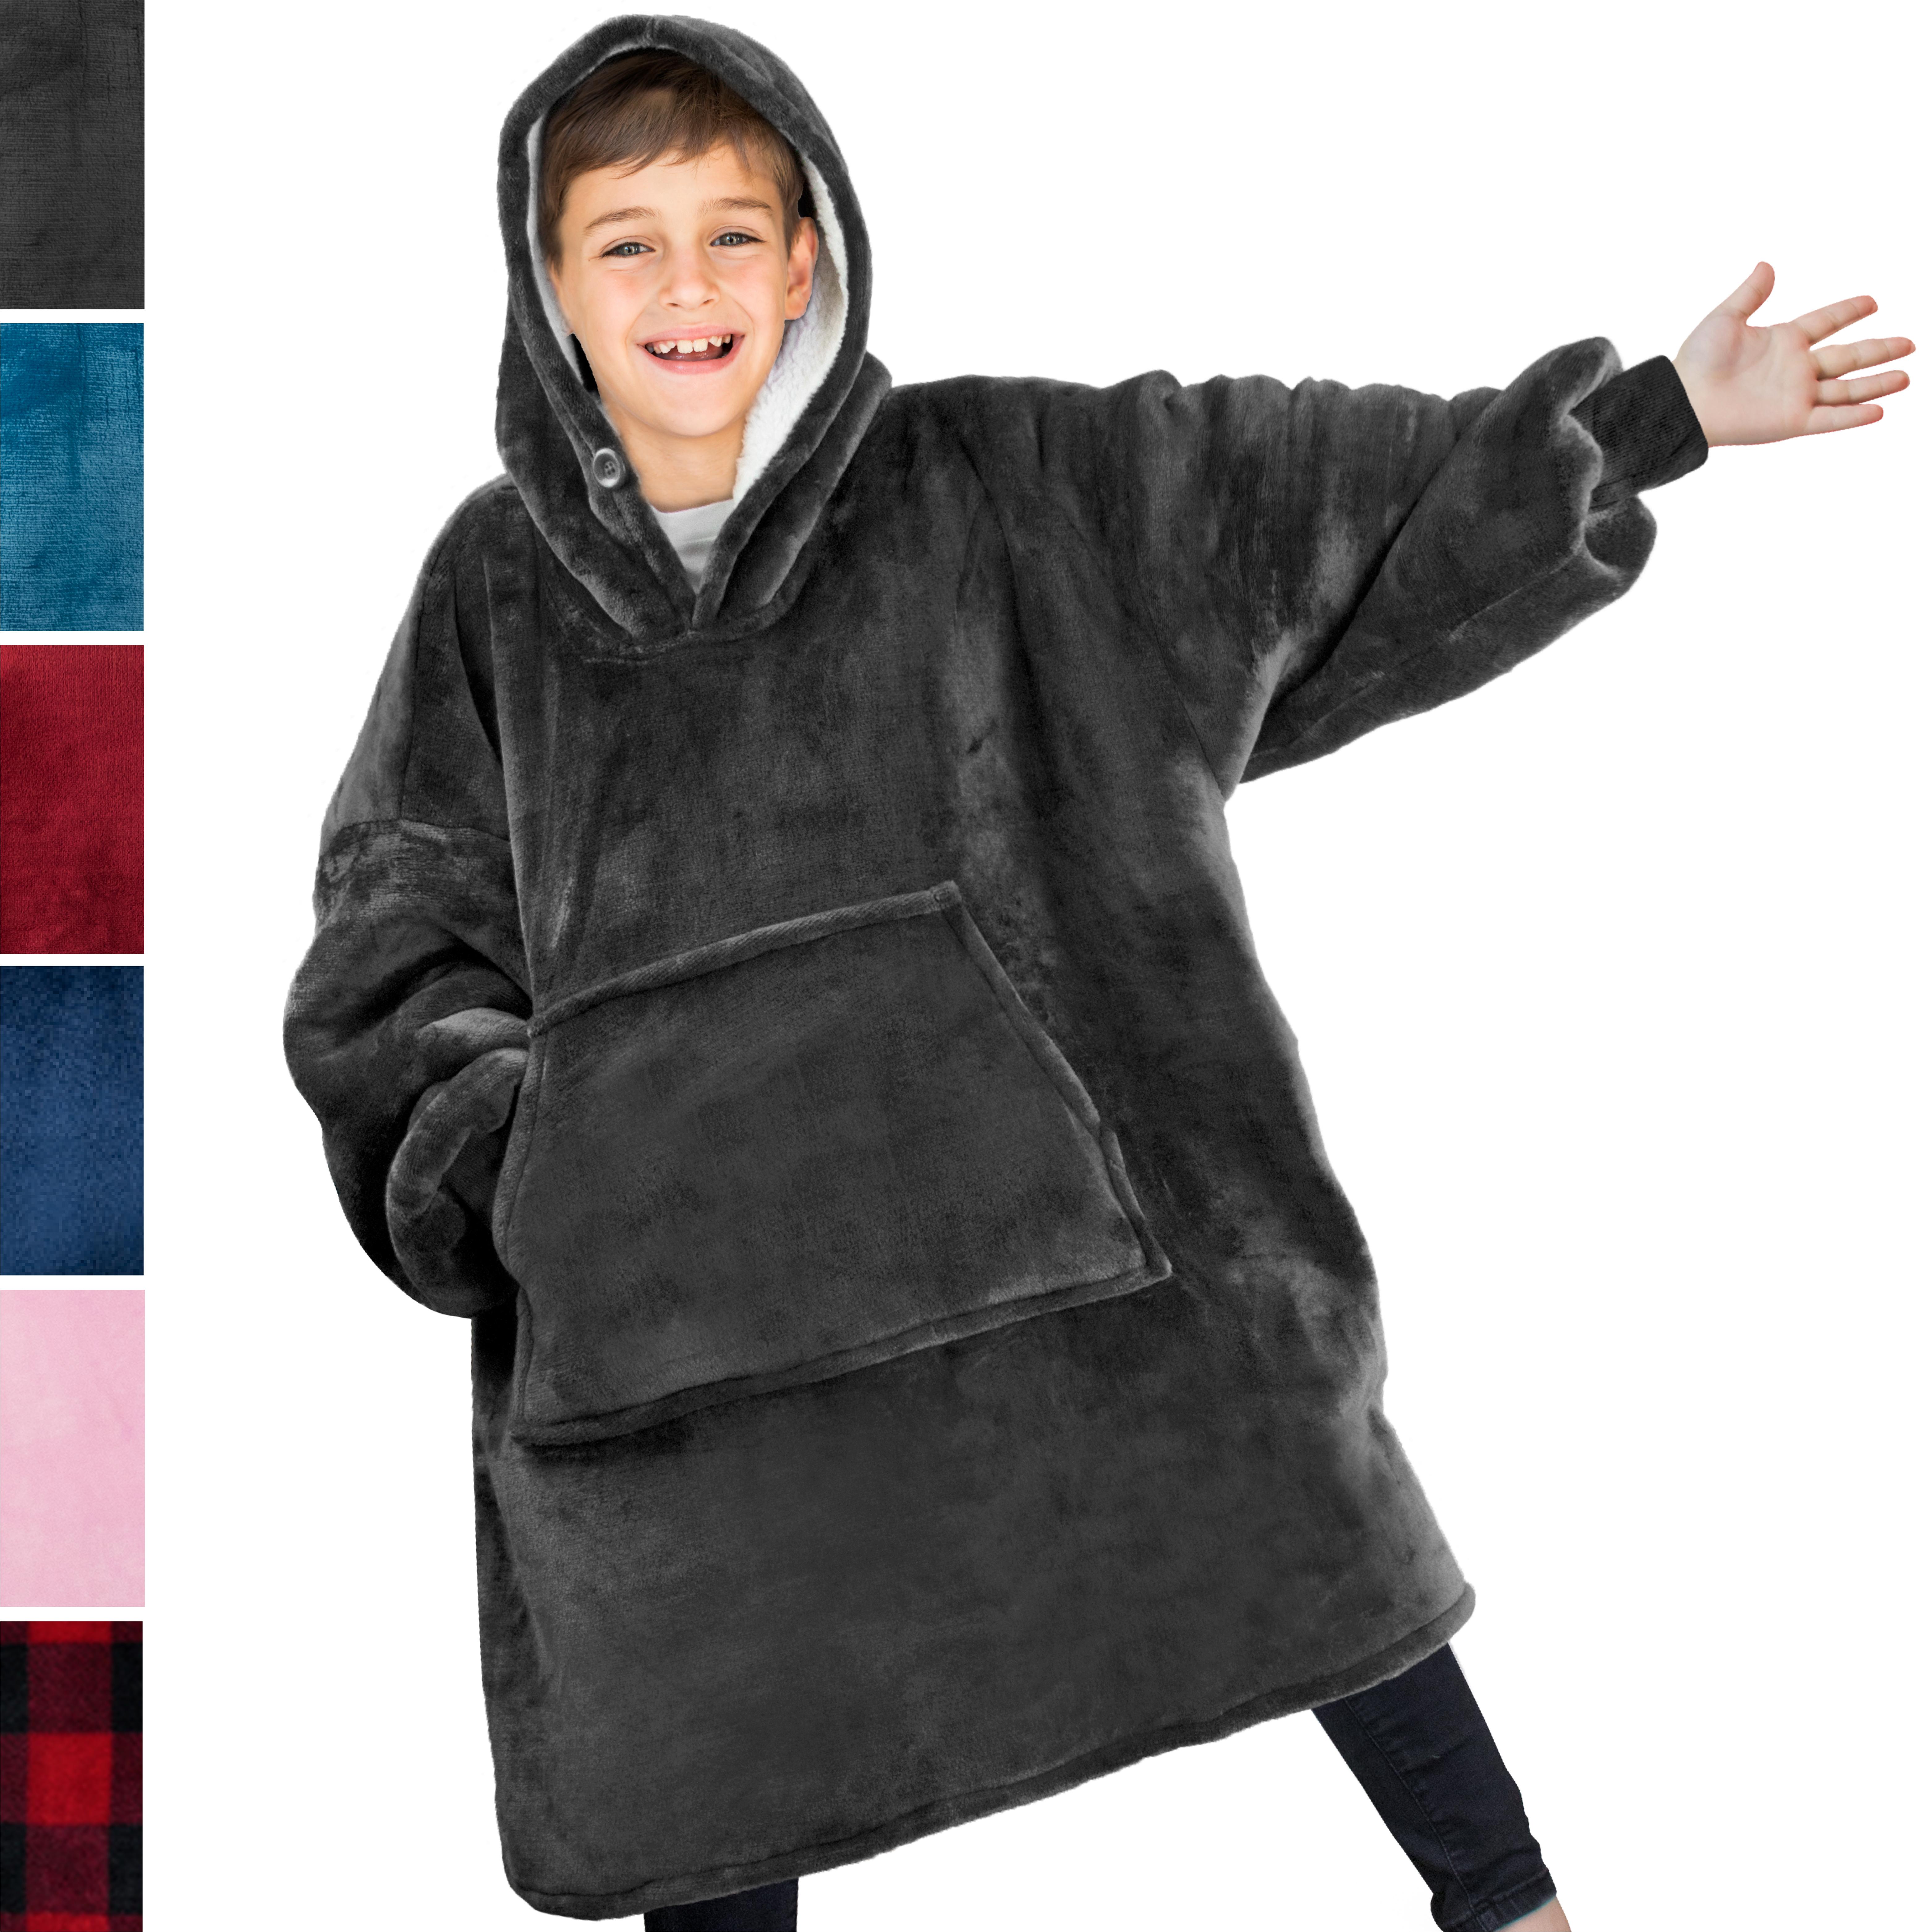 Comfy Hoodie Sweatshirt Wearable Blanket For Kids With Sleeves Pocket Oversized Ebay